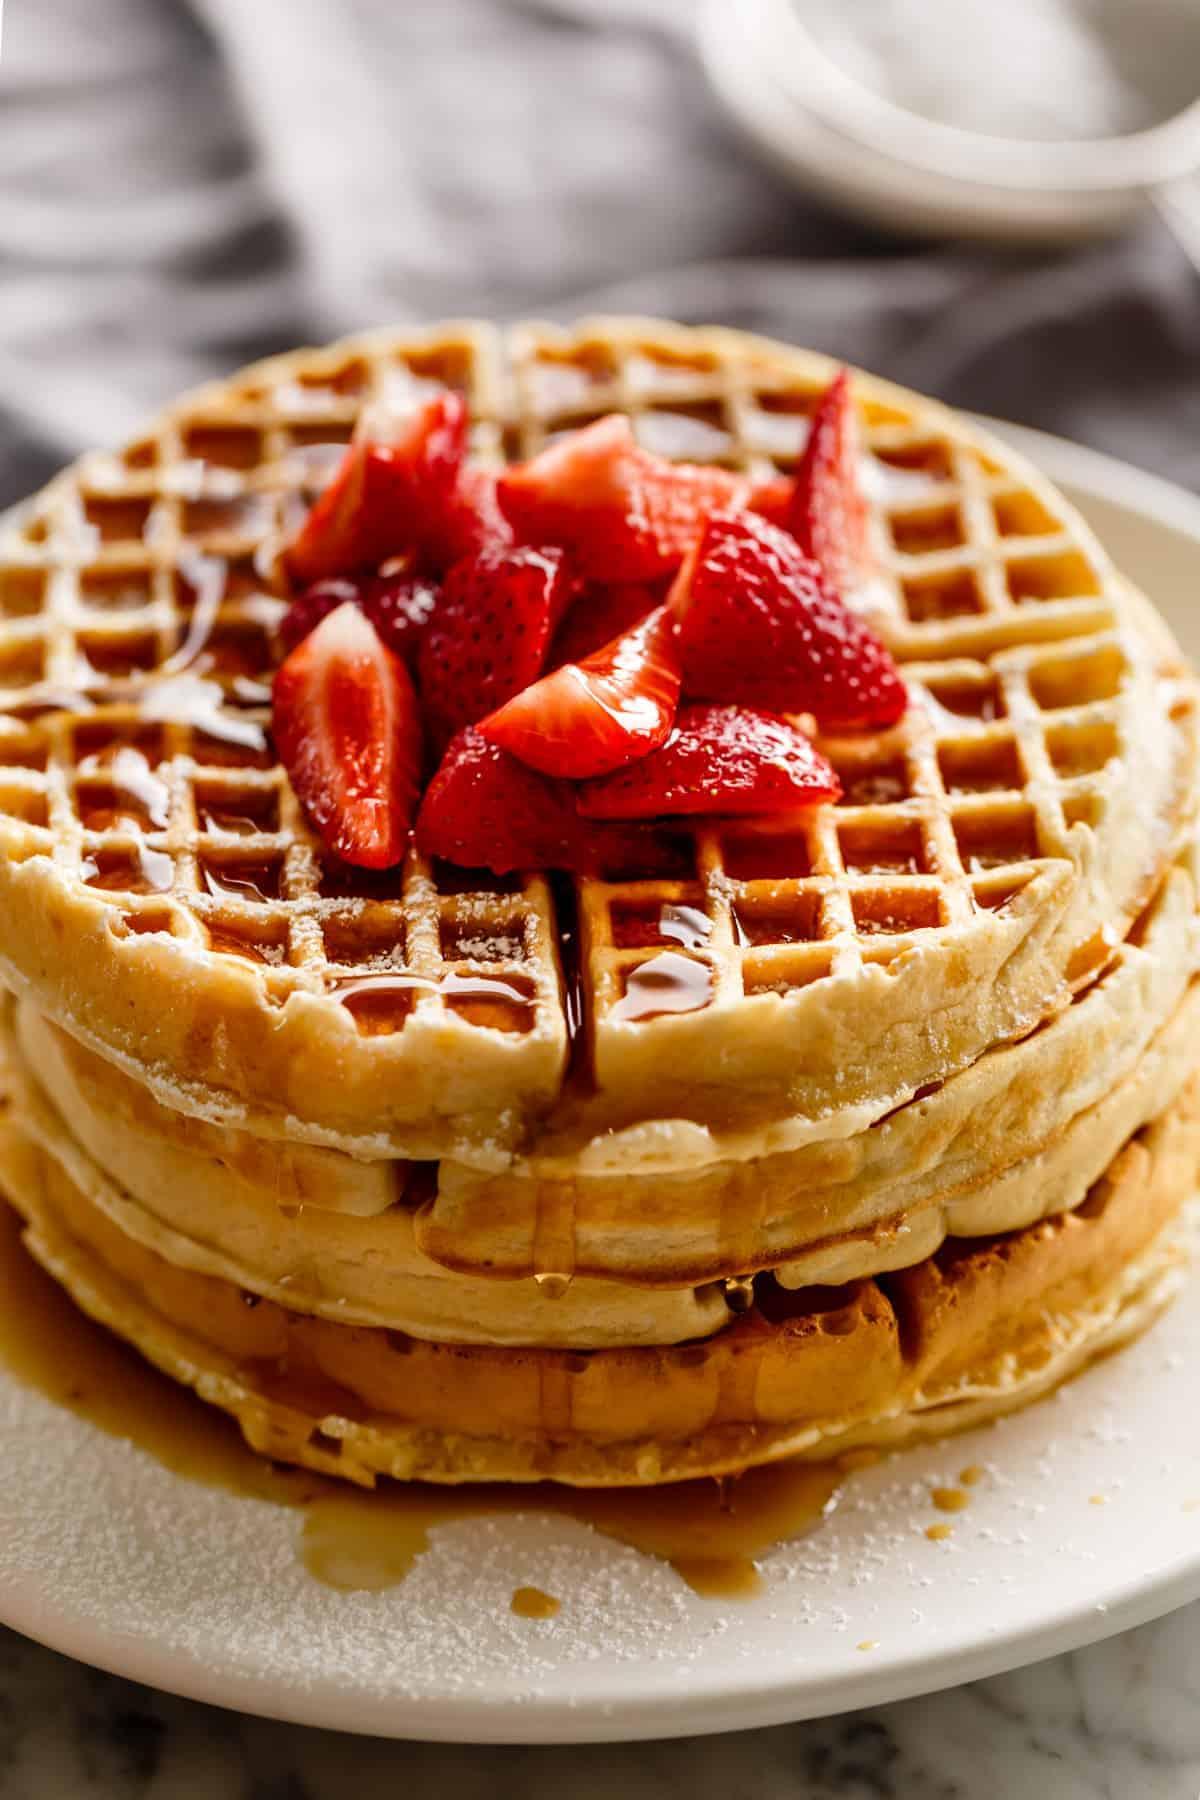 Easy Homemade Belgian Waffles recipe guarantees perfect, fluffy waffles every time! | #belgiumwaffles #waffles #breakfast #brunch #easy #recipe